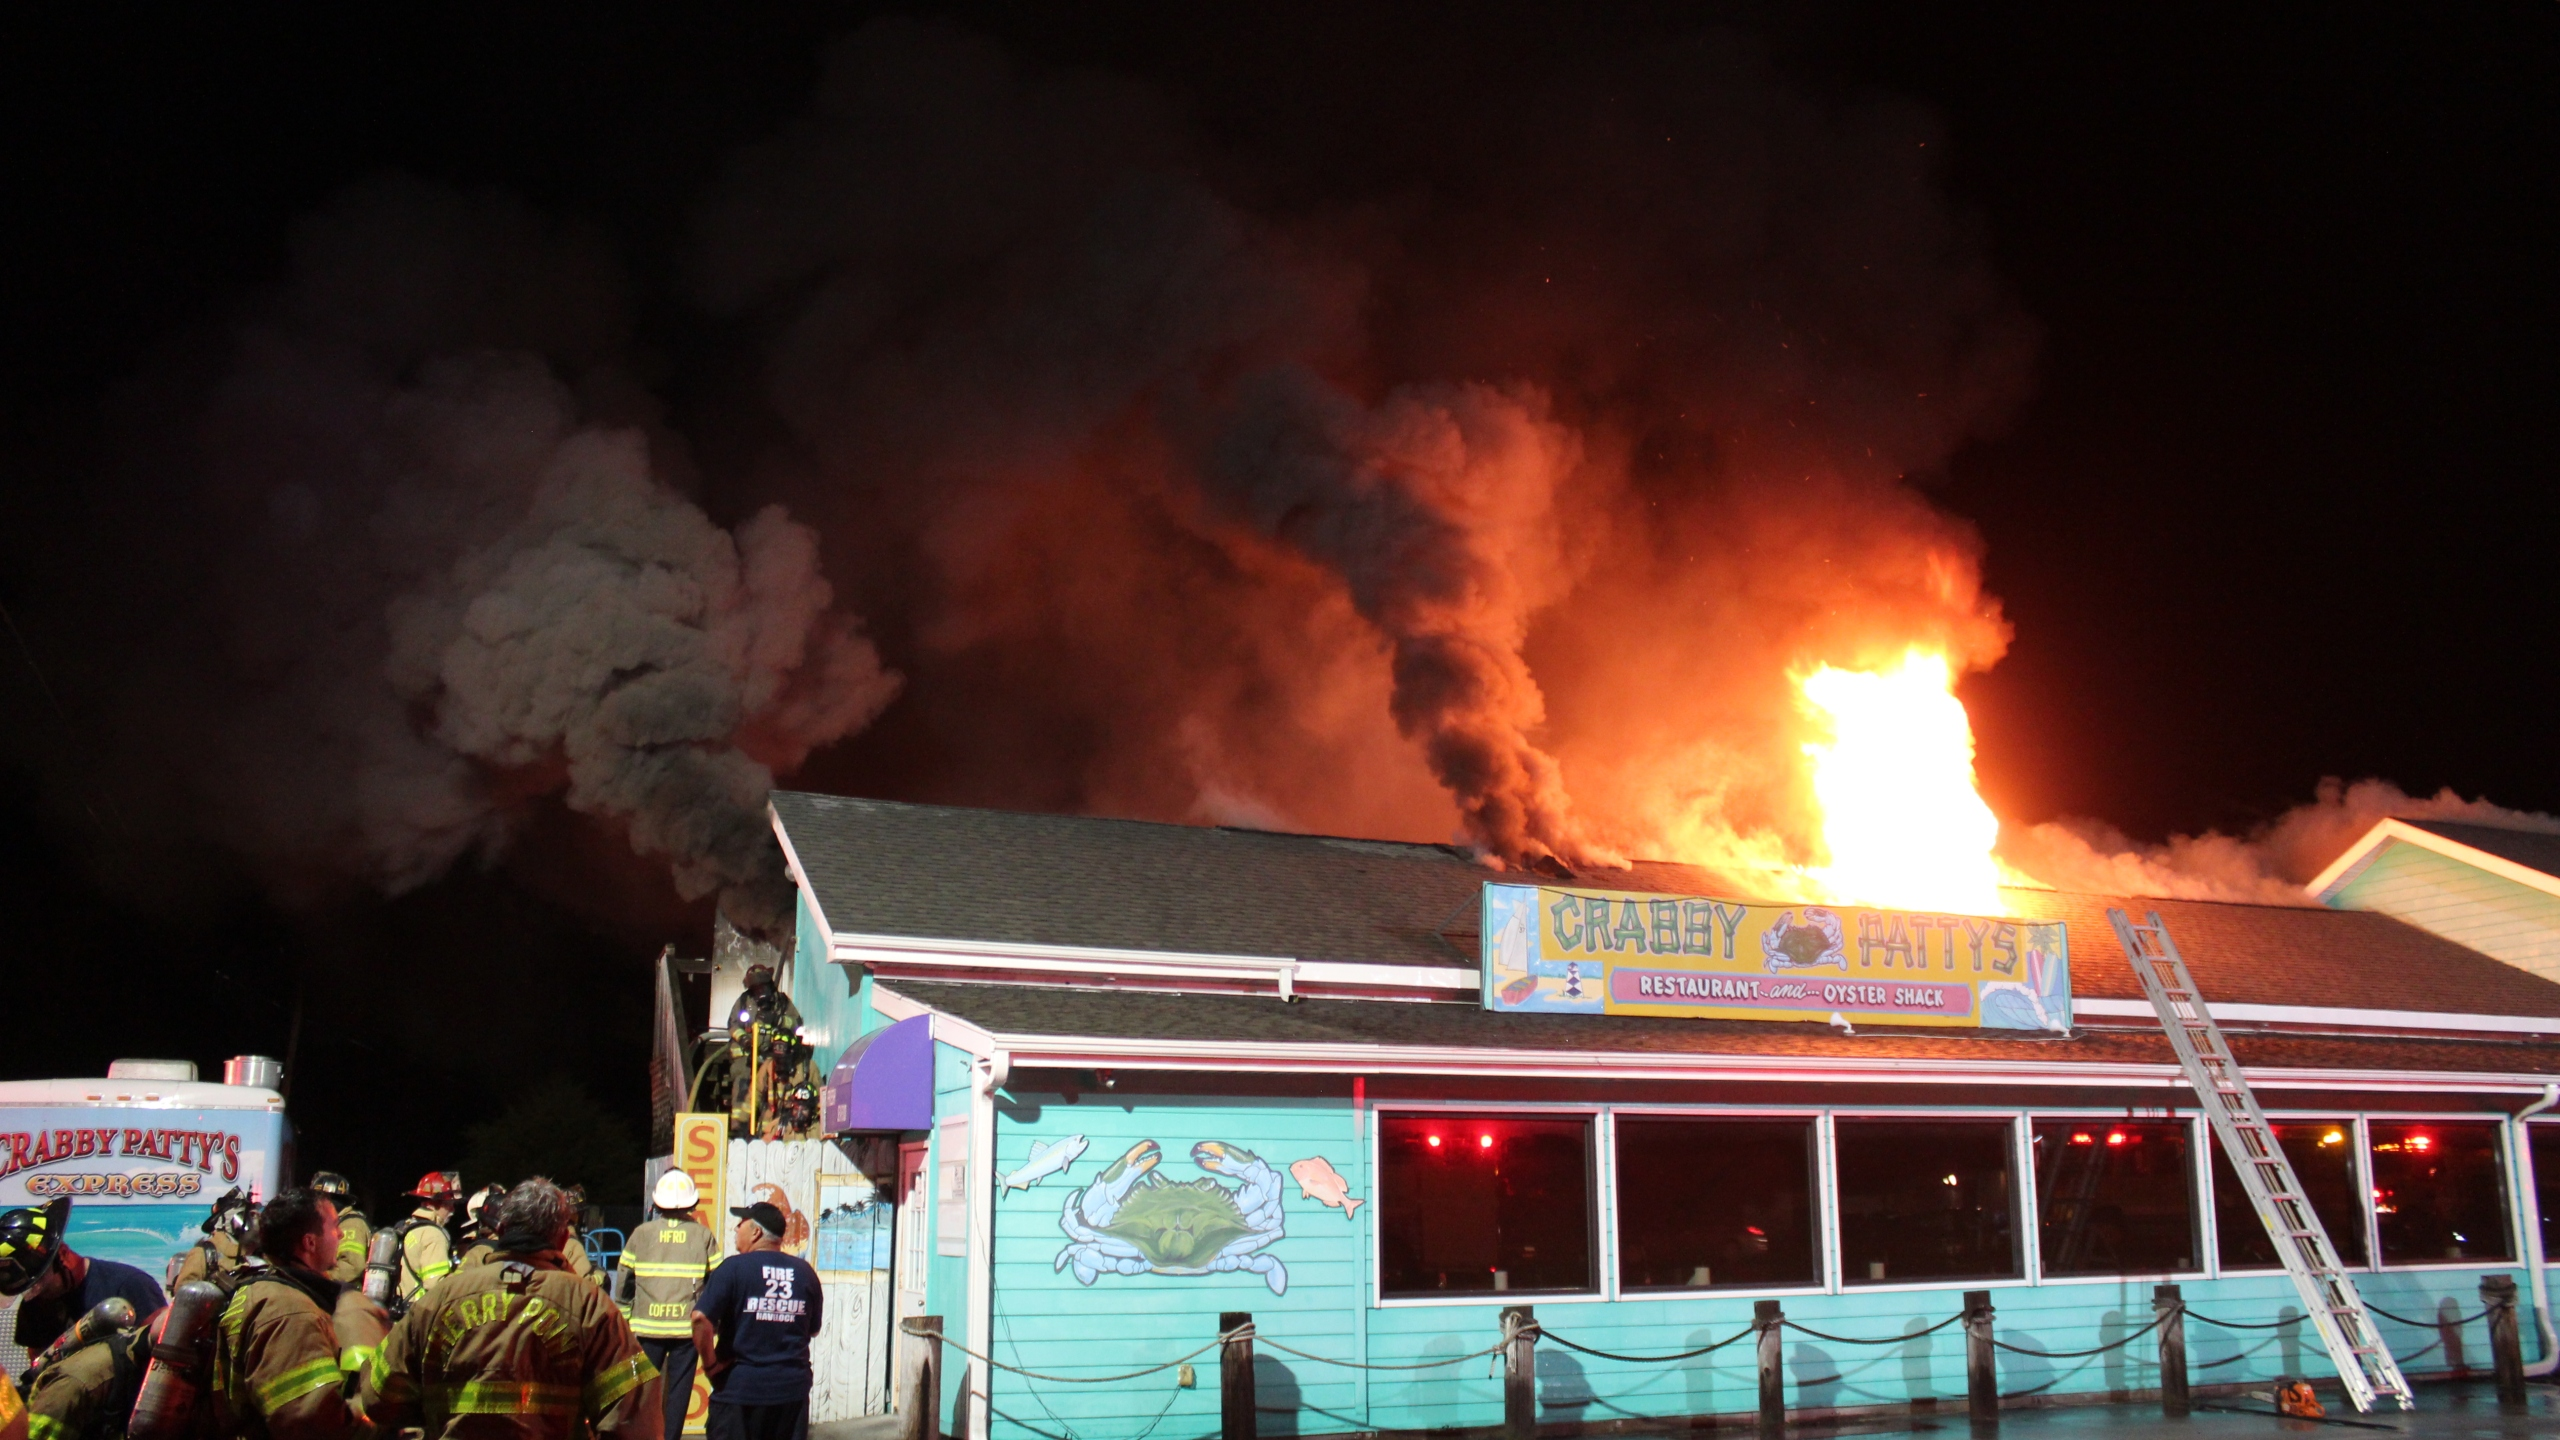 Crabby Patty's fire_266368